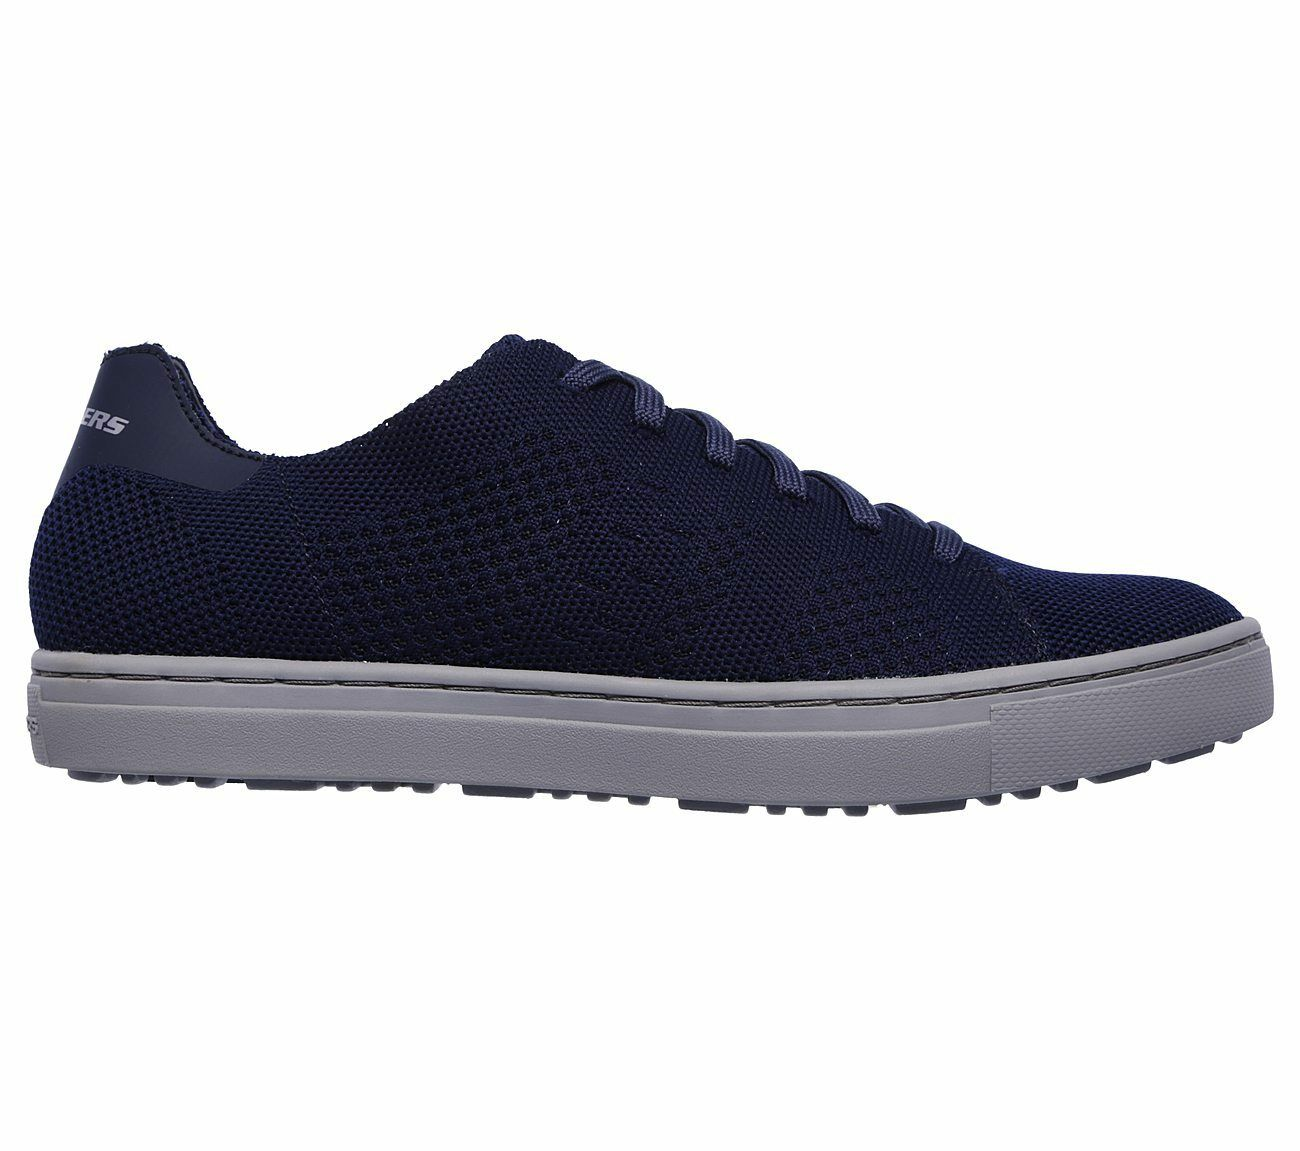 65221-NVY, Skechers Schuhe – Alven Moneco blau, Herren, 2018, Textil